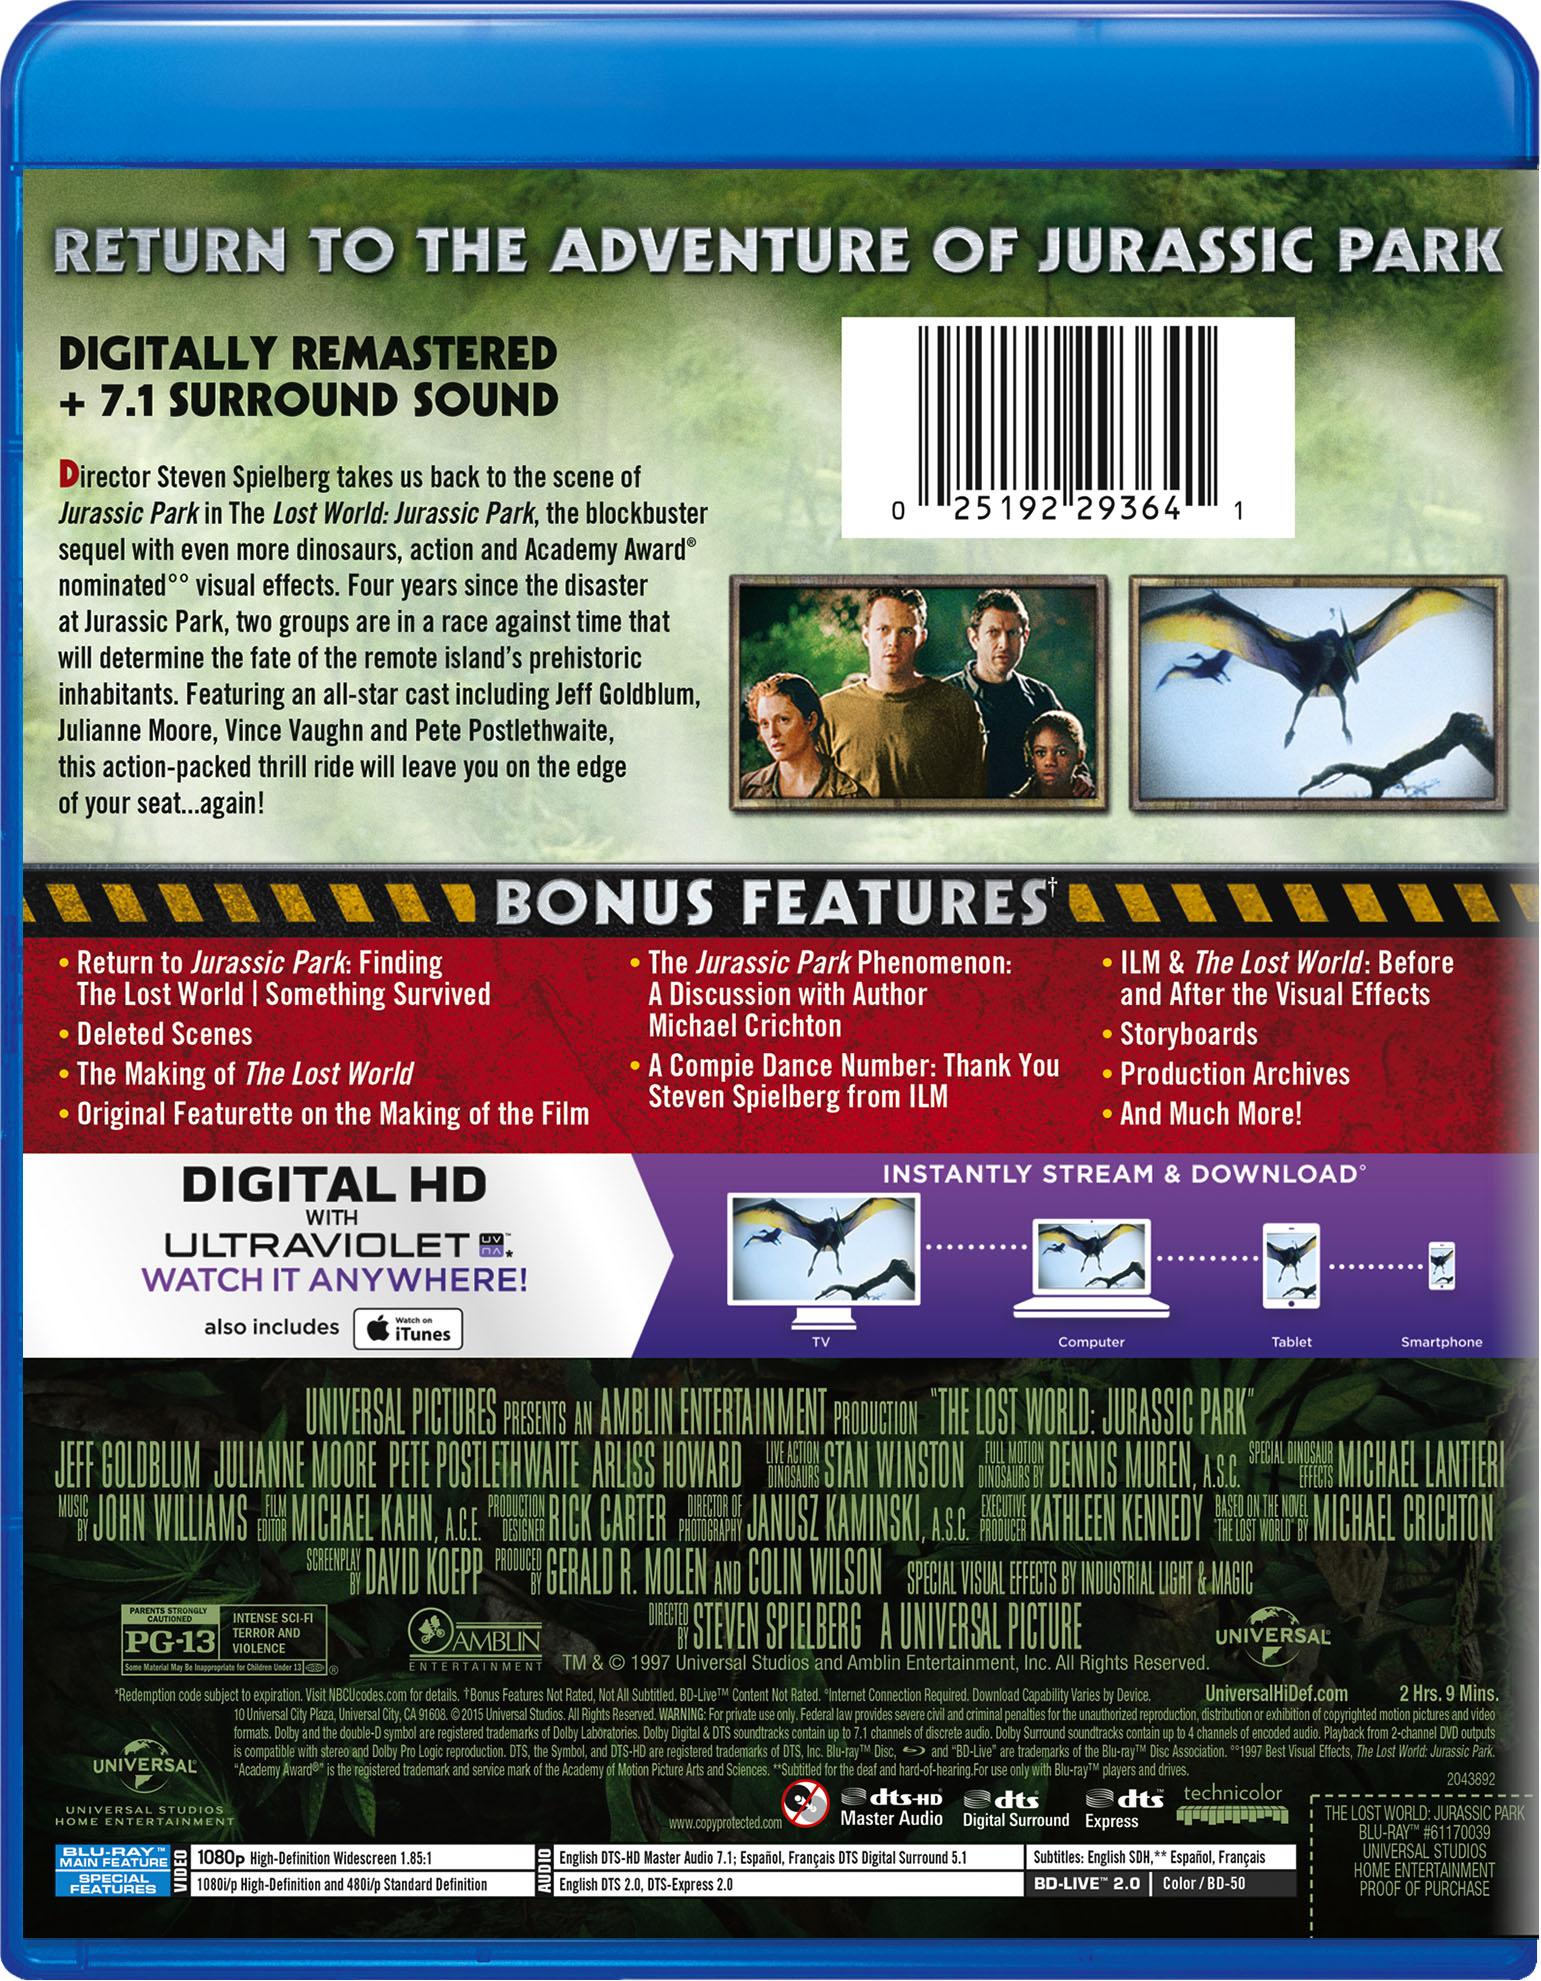 The Lost World: Jurassic Park | Movie Page | DVD, Blu-ray ... | 1541 x 1981 jpeg 715kB